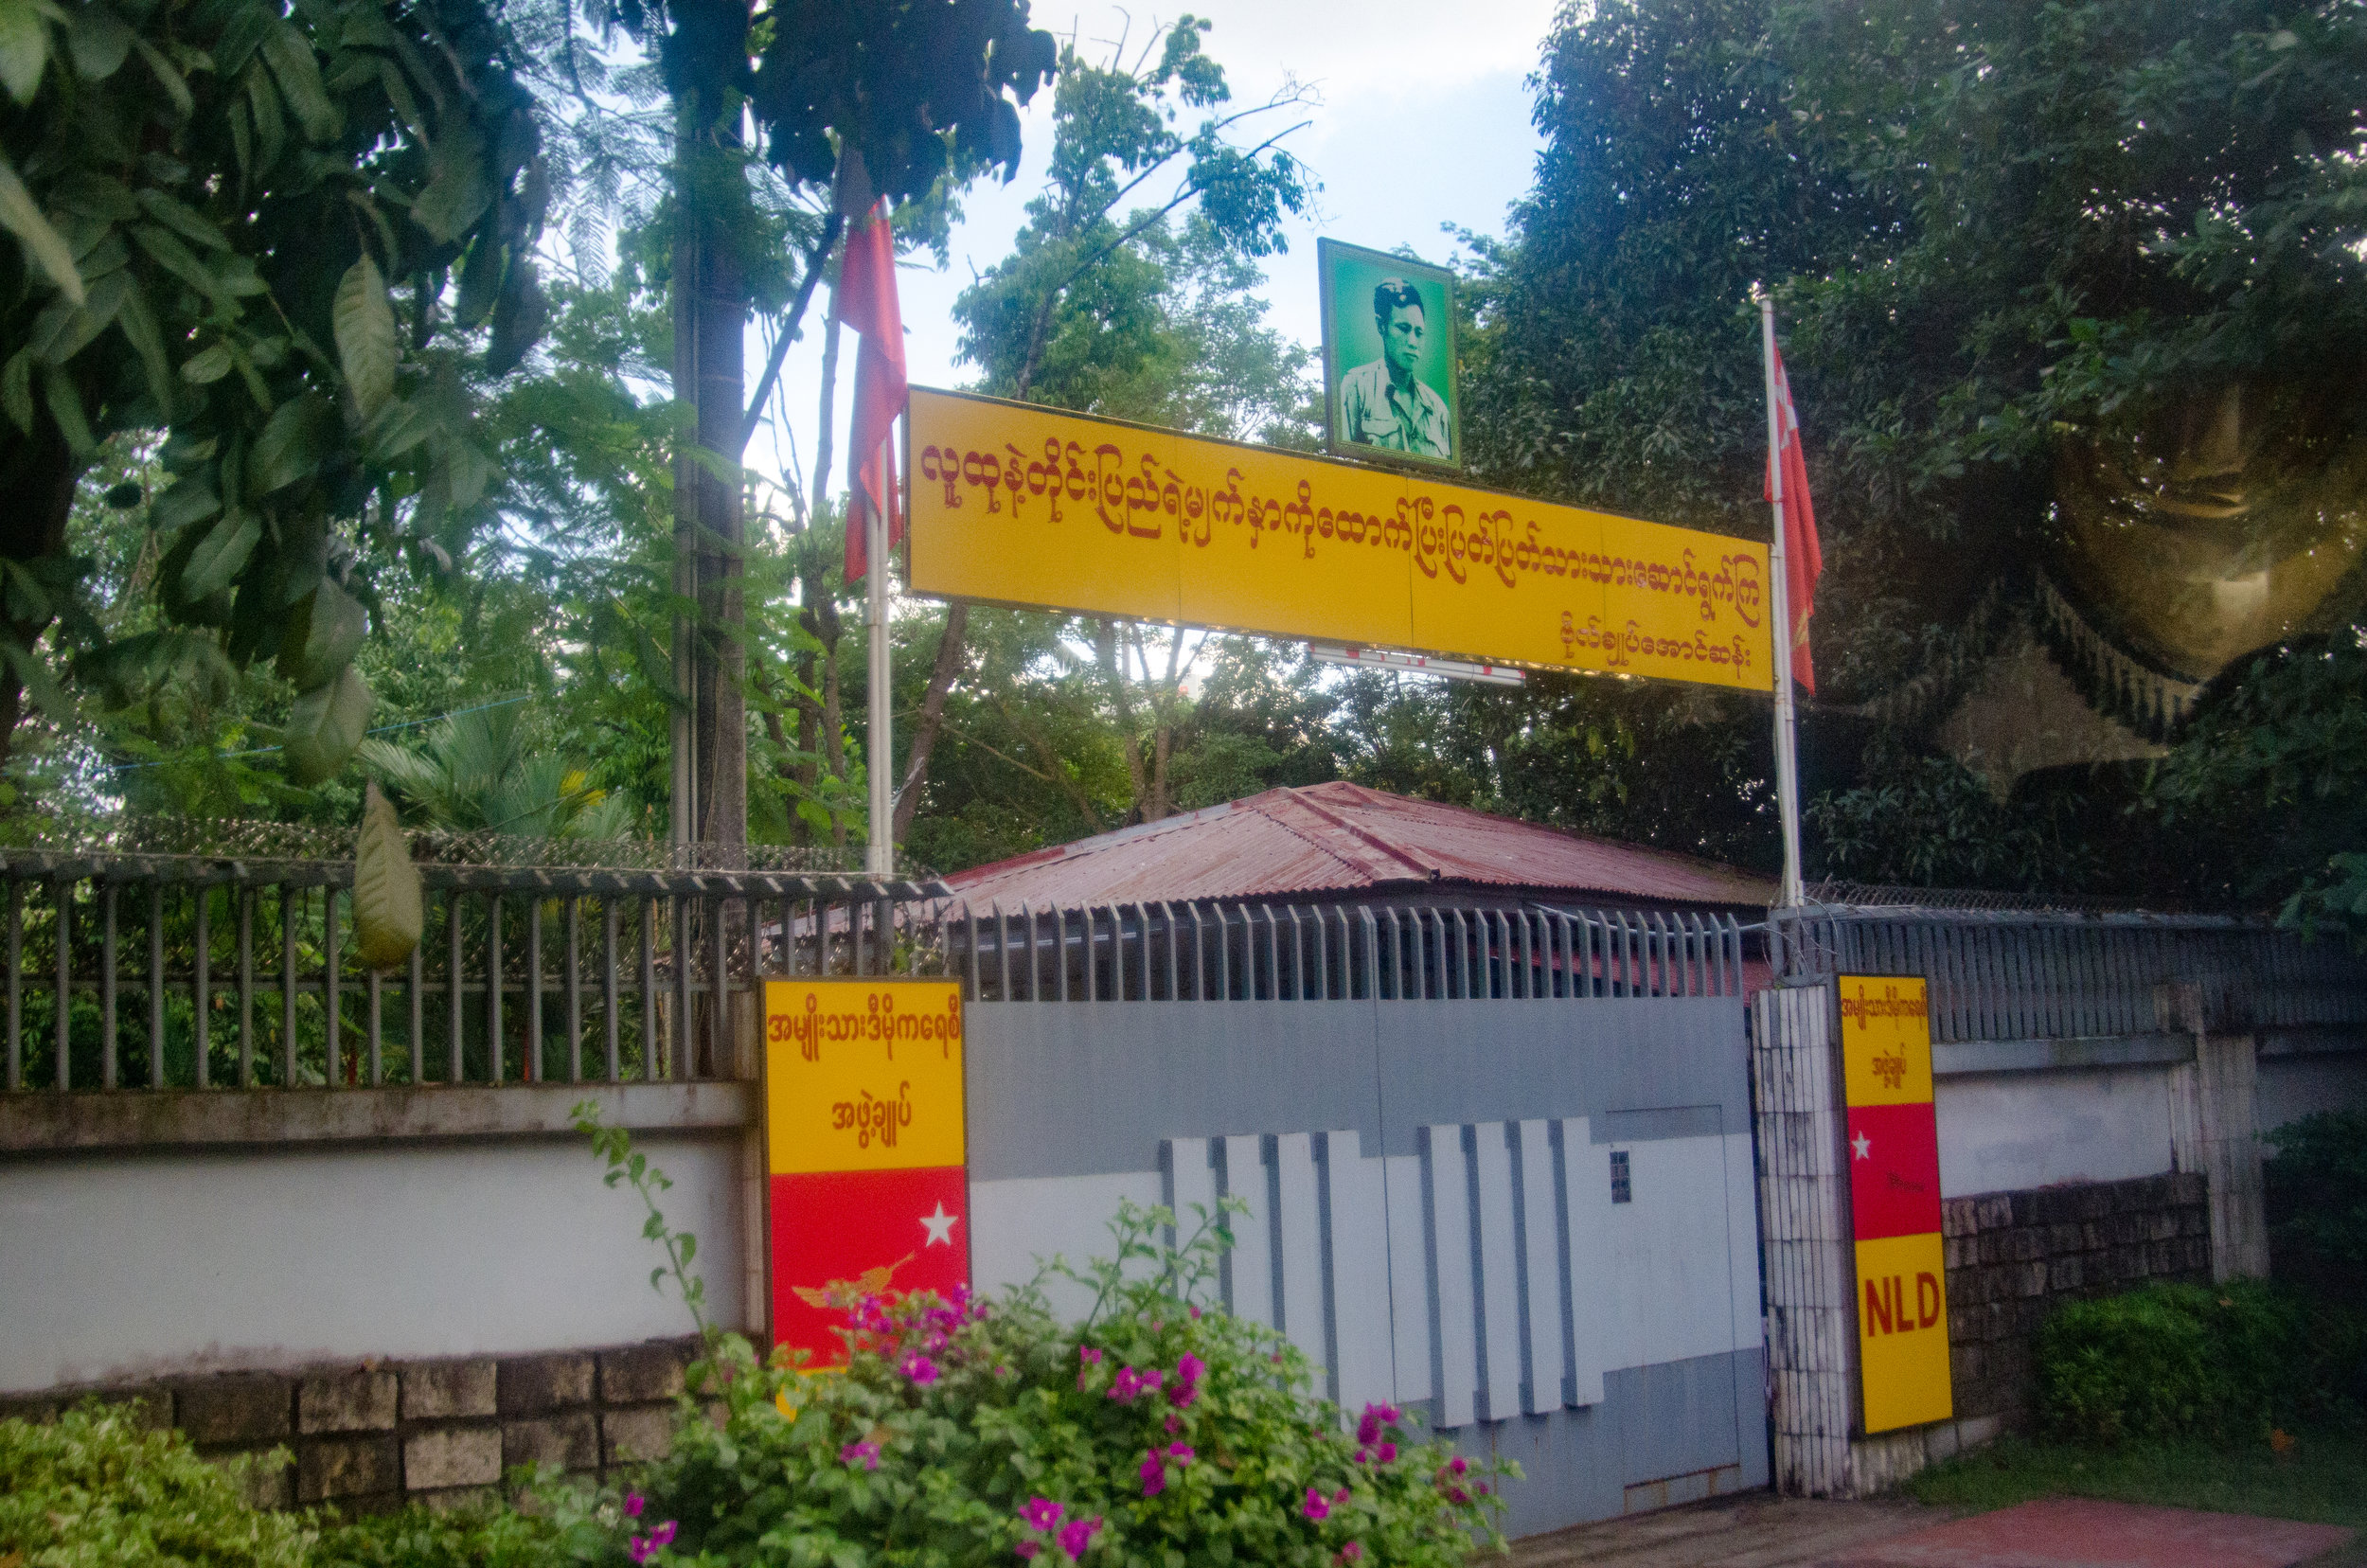 House where Aung San Suu Kyi was under house arrest, Yangon, Myanmar